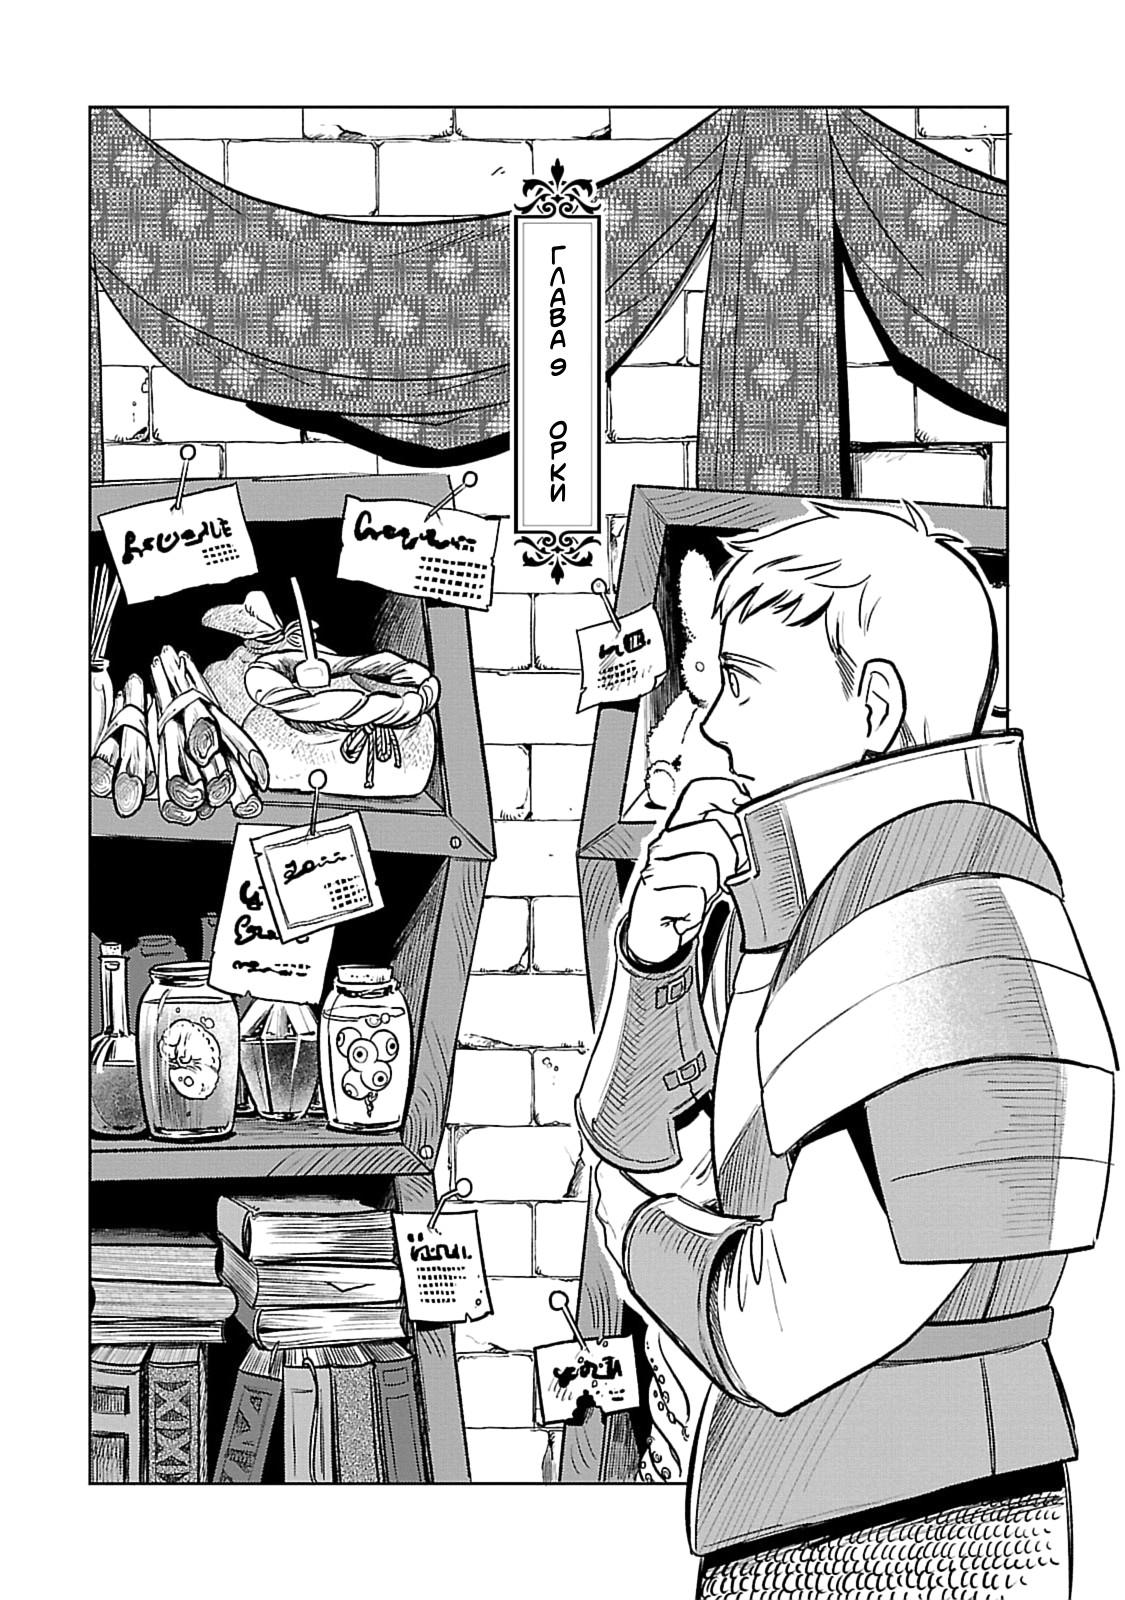 https://r1.ninemanga.com/comics/pic2/50/27634/289291/1461001617900.jpg Page 1